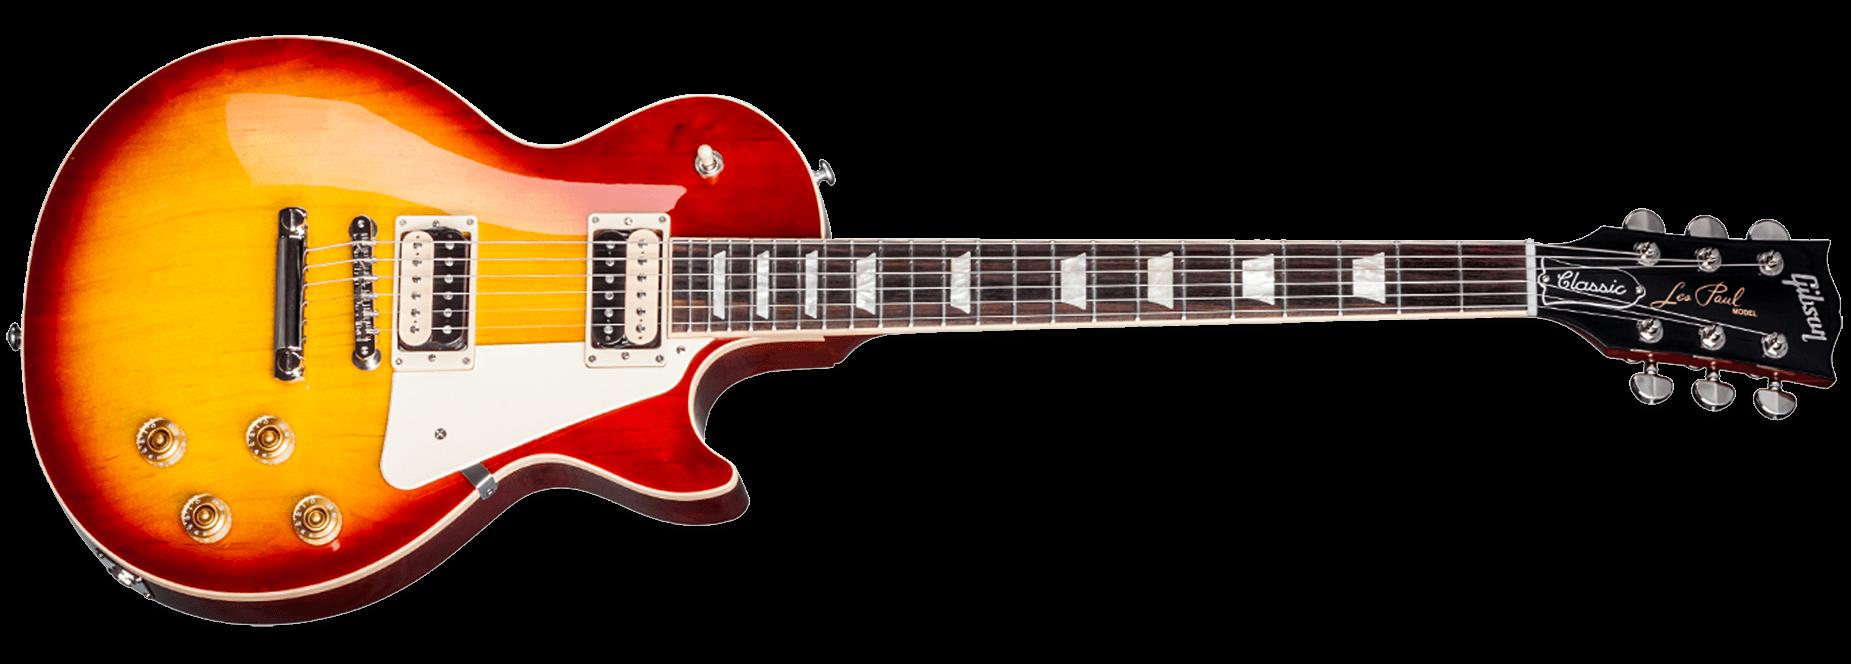 Gibson Les-Paul Classic 2017 T Heritage Cherry Sunburst